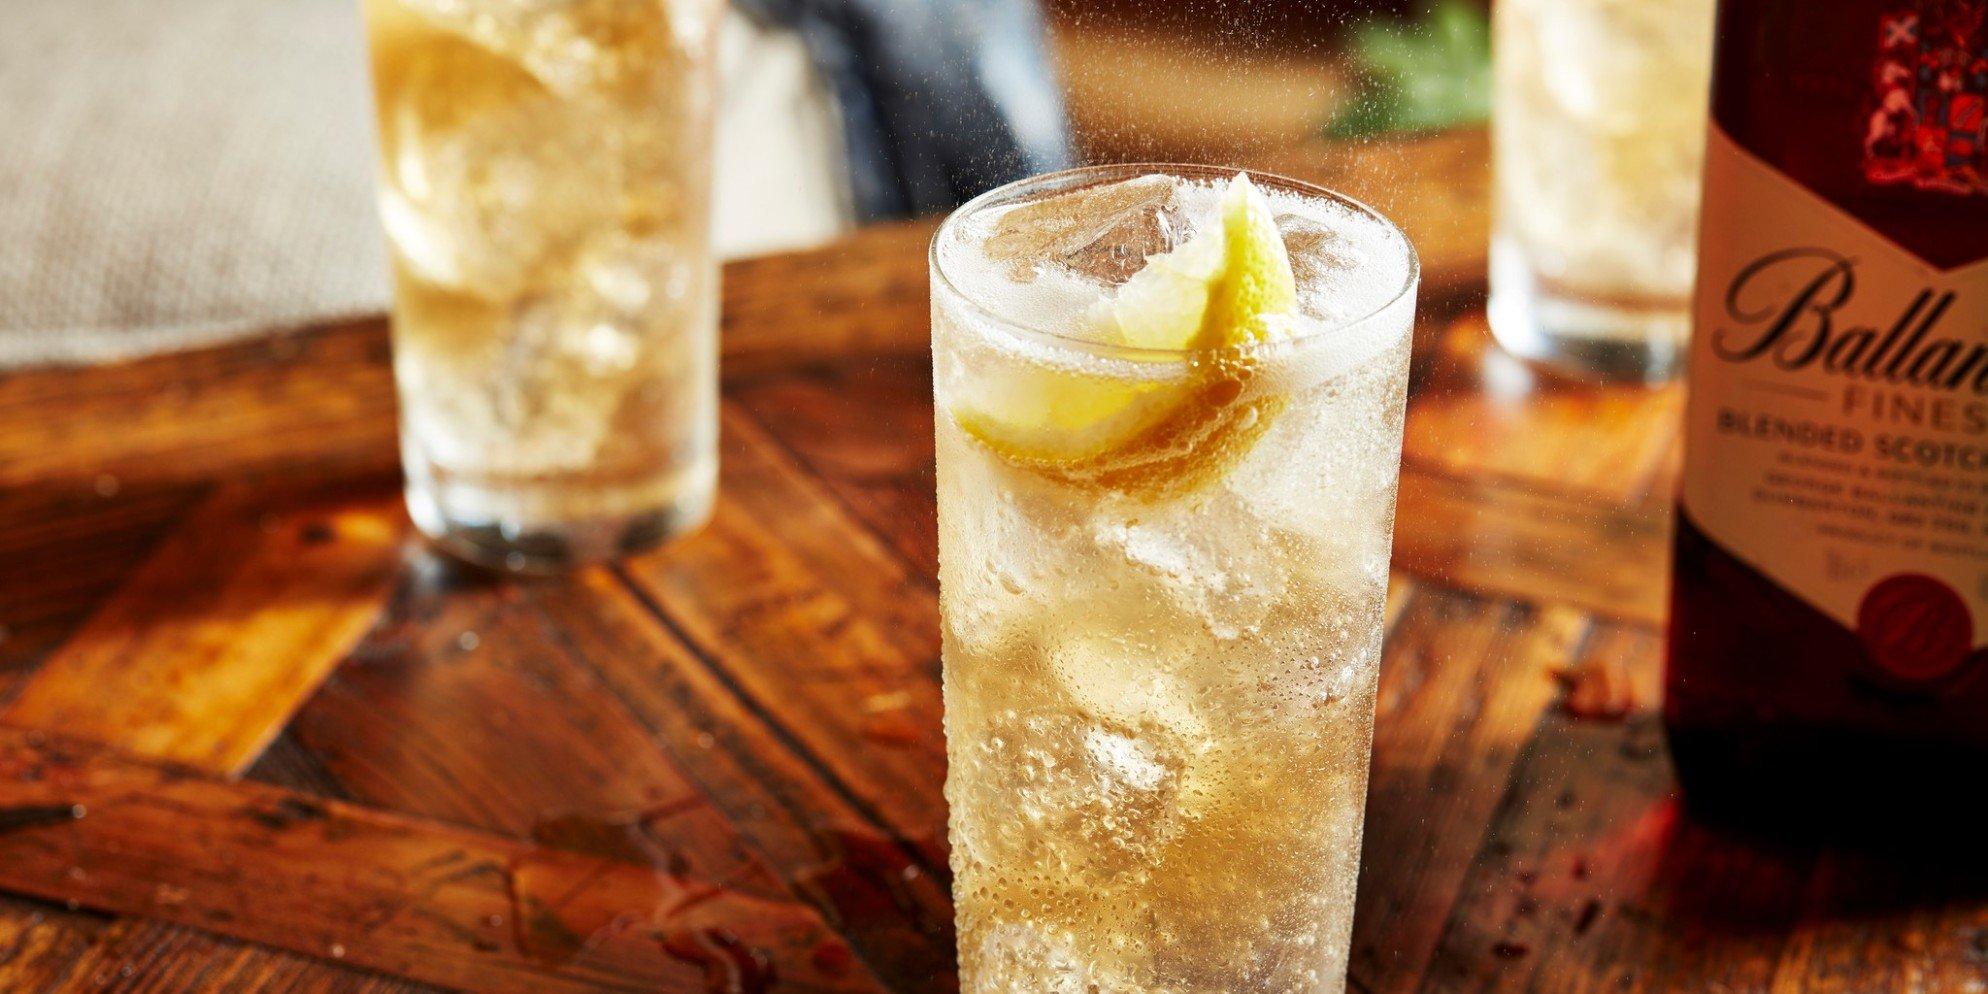 Cócteles de whisky | Session Soda | Clásico